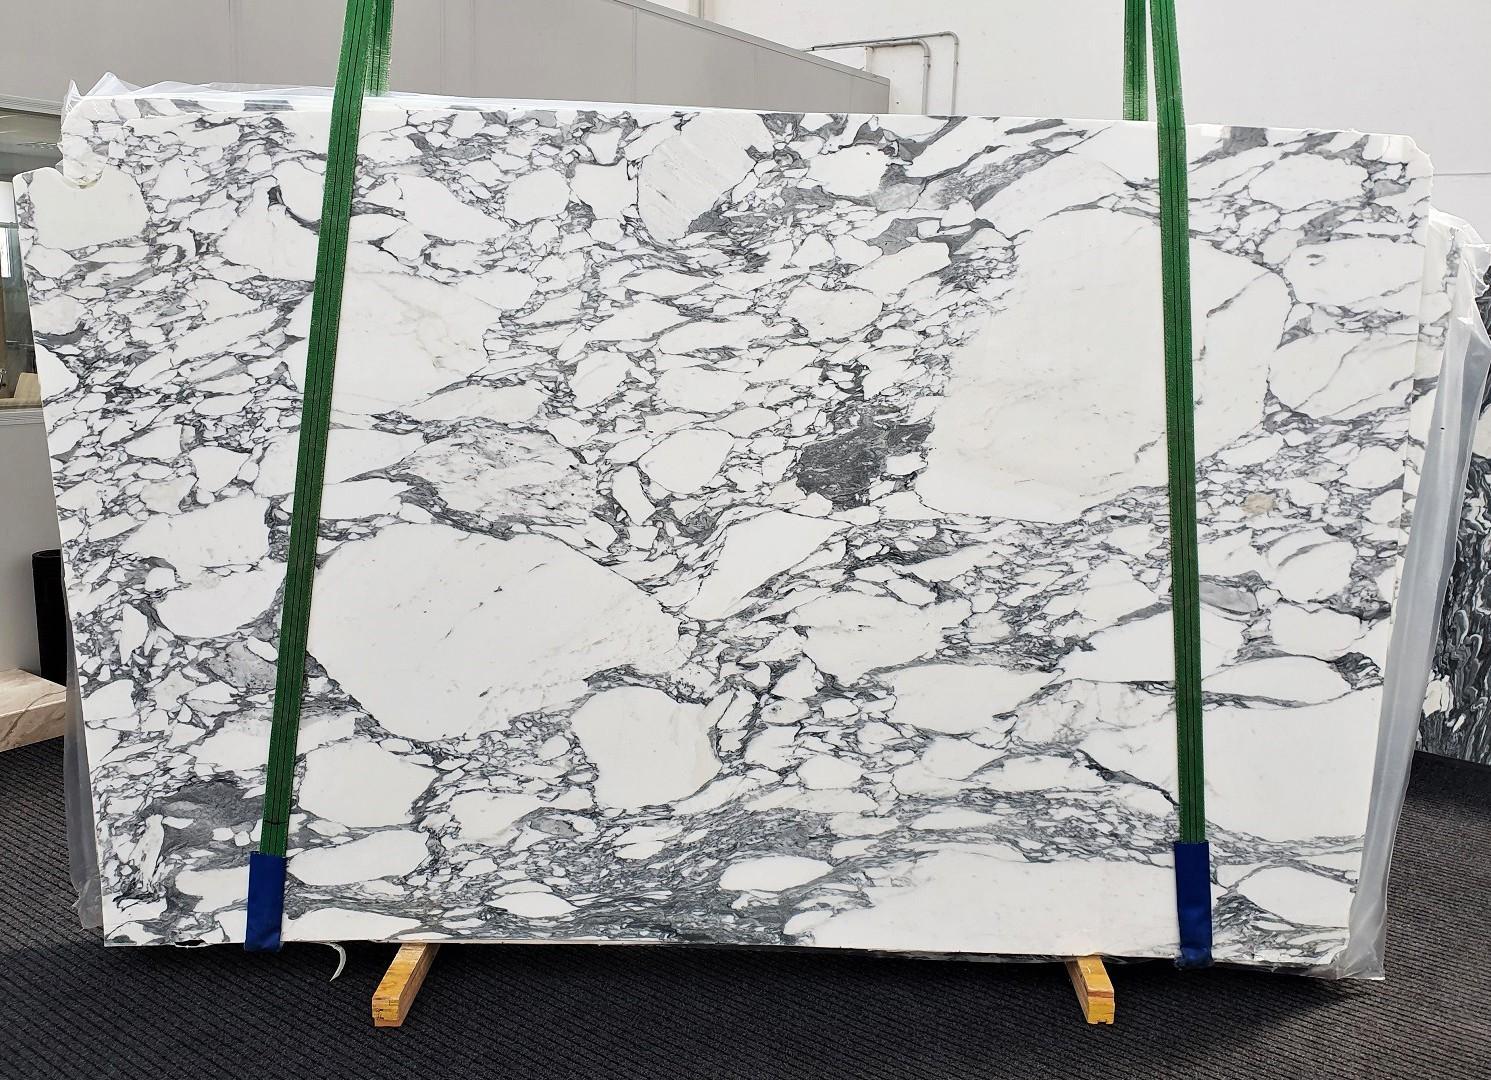 ARABESCATO CORCHIA Fourniture Veneto (Italie) d' dalles brillantes en marbre naturel 1433 , Slab #55